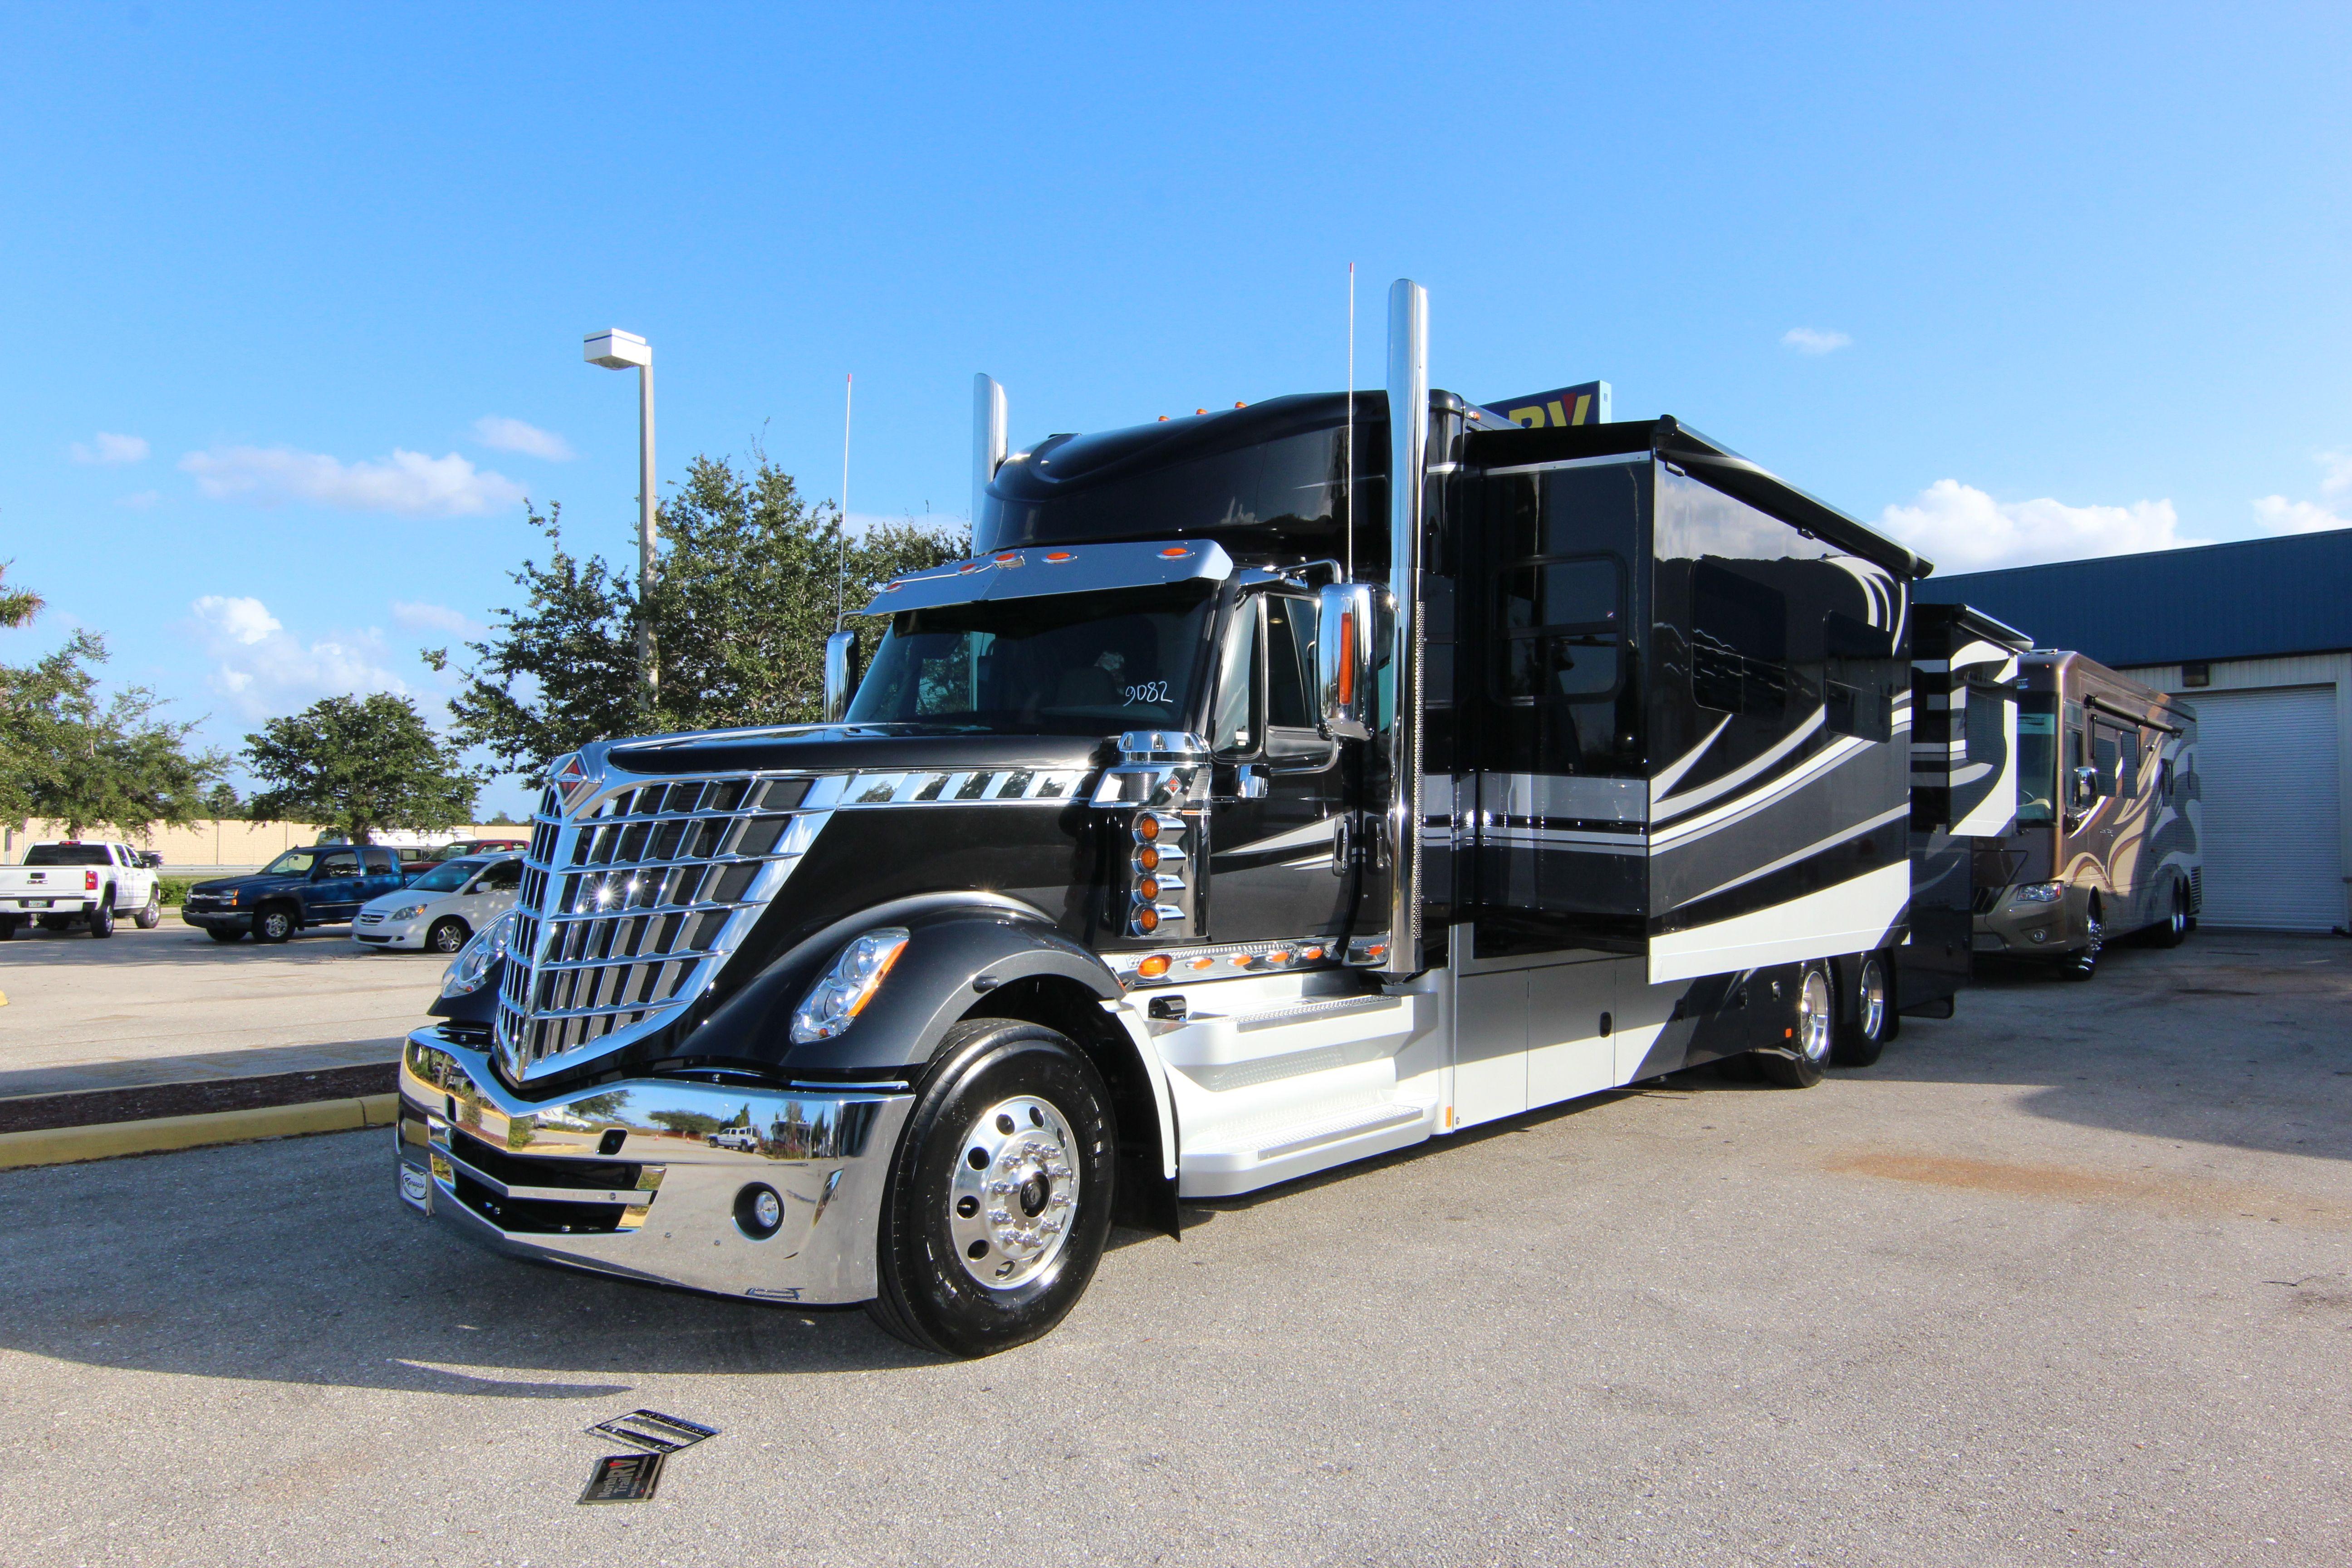 2016 Renegade XL LoneStar | Renegade RVs | Rv truck, Rv